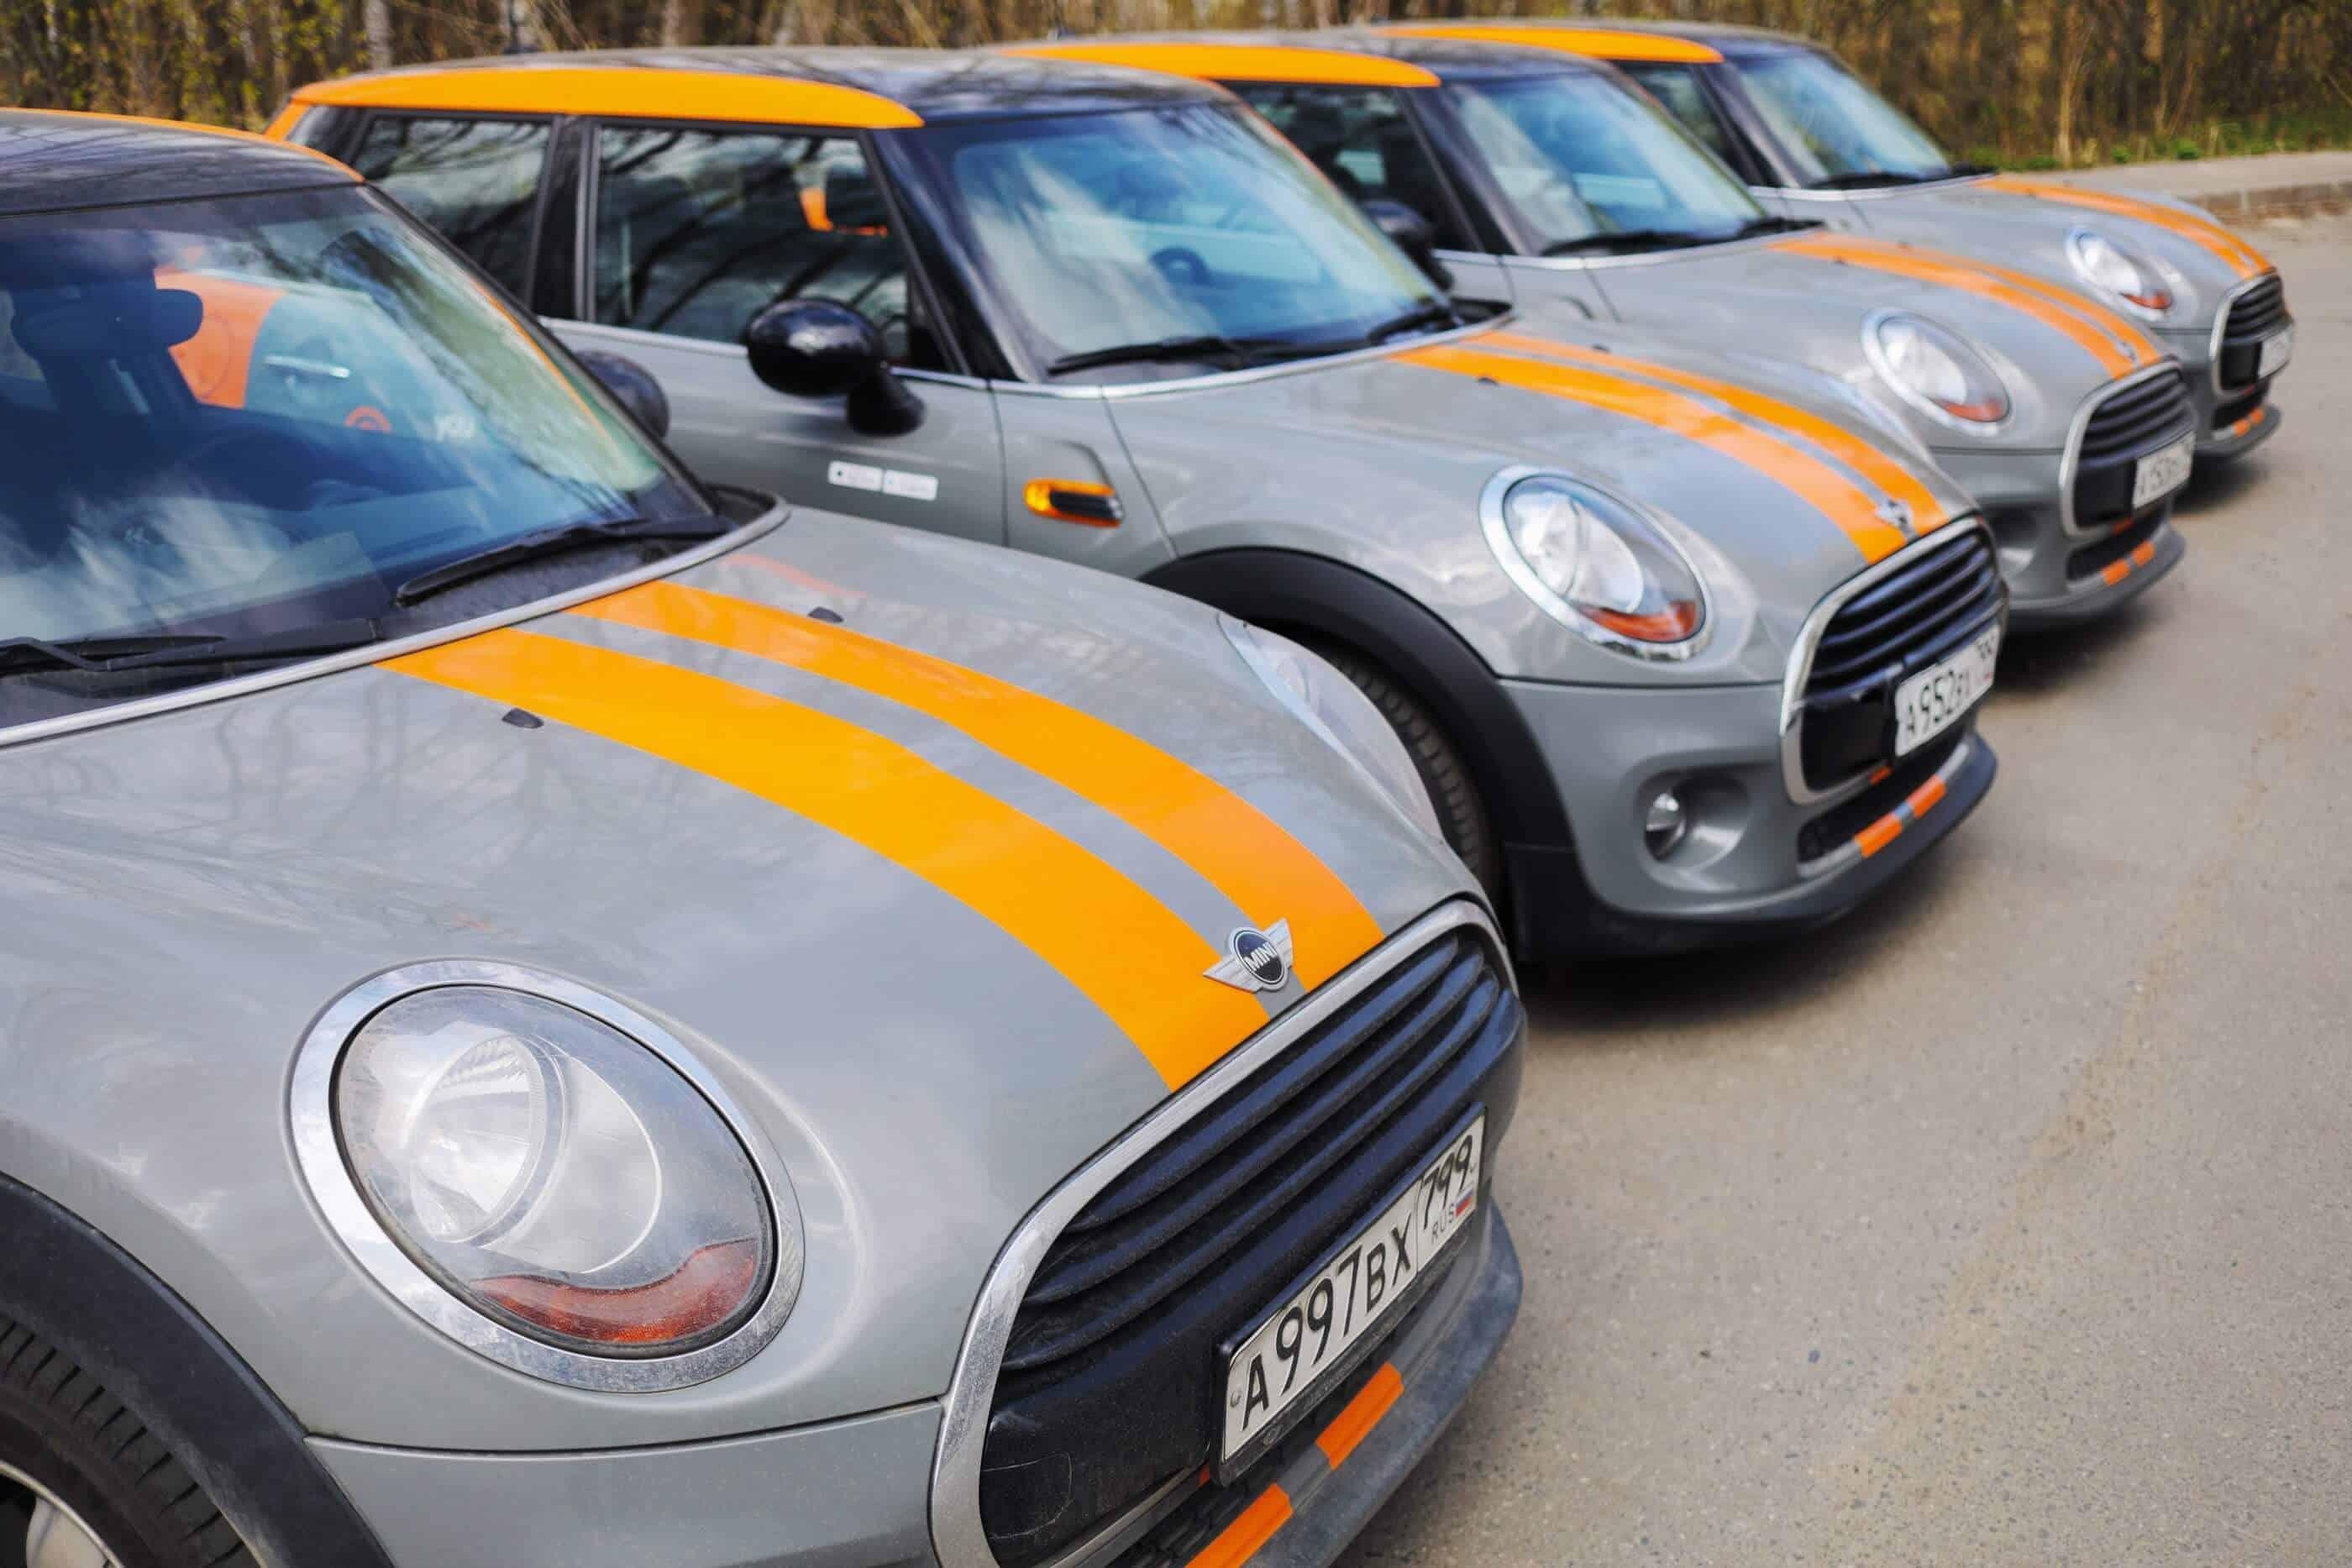 Rental fleet of cars